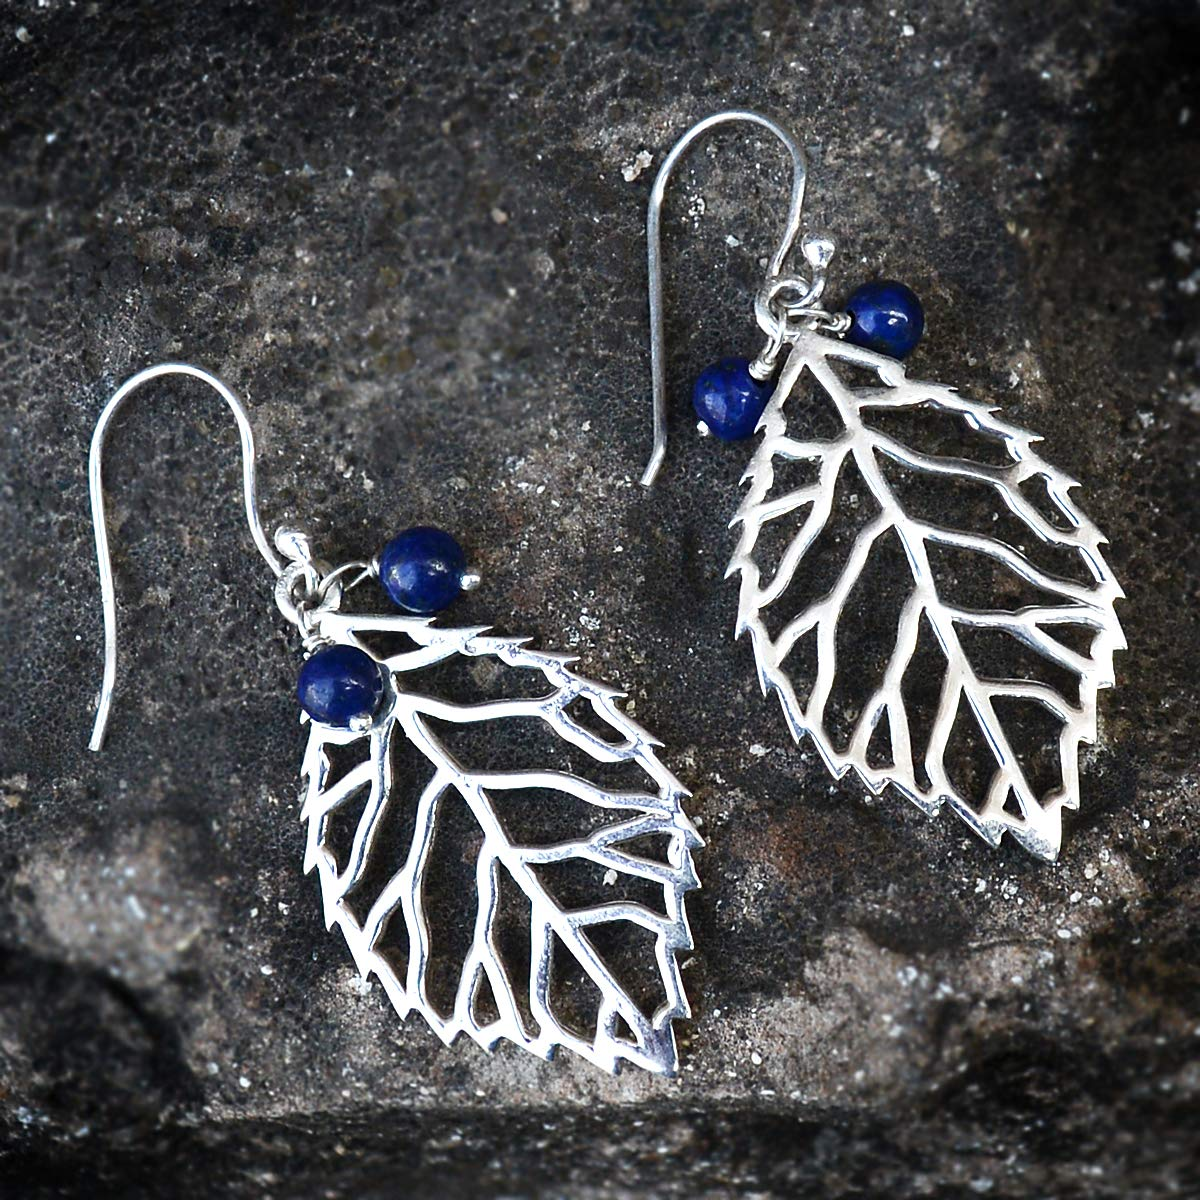 Silvestoo Jaipur Lapis Lazuli Gemstone 925 Sterling Silver Earring PG-156042